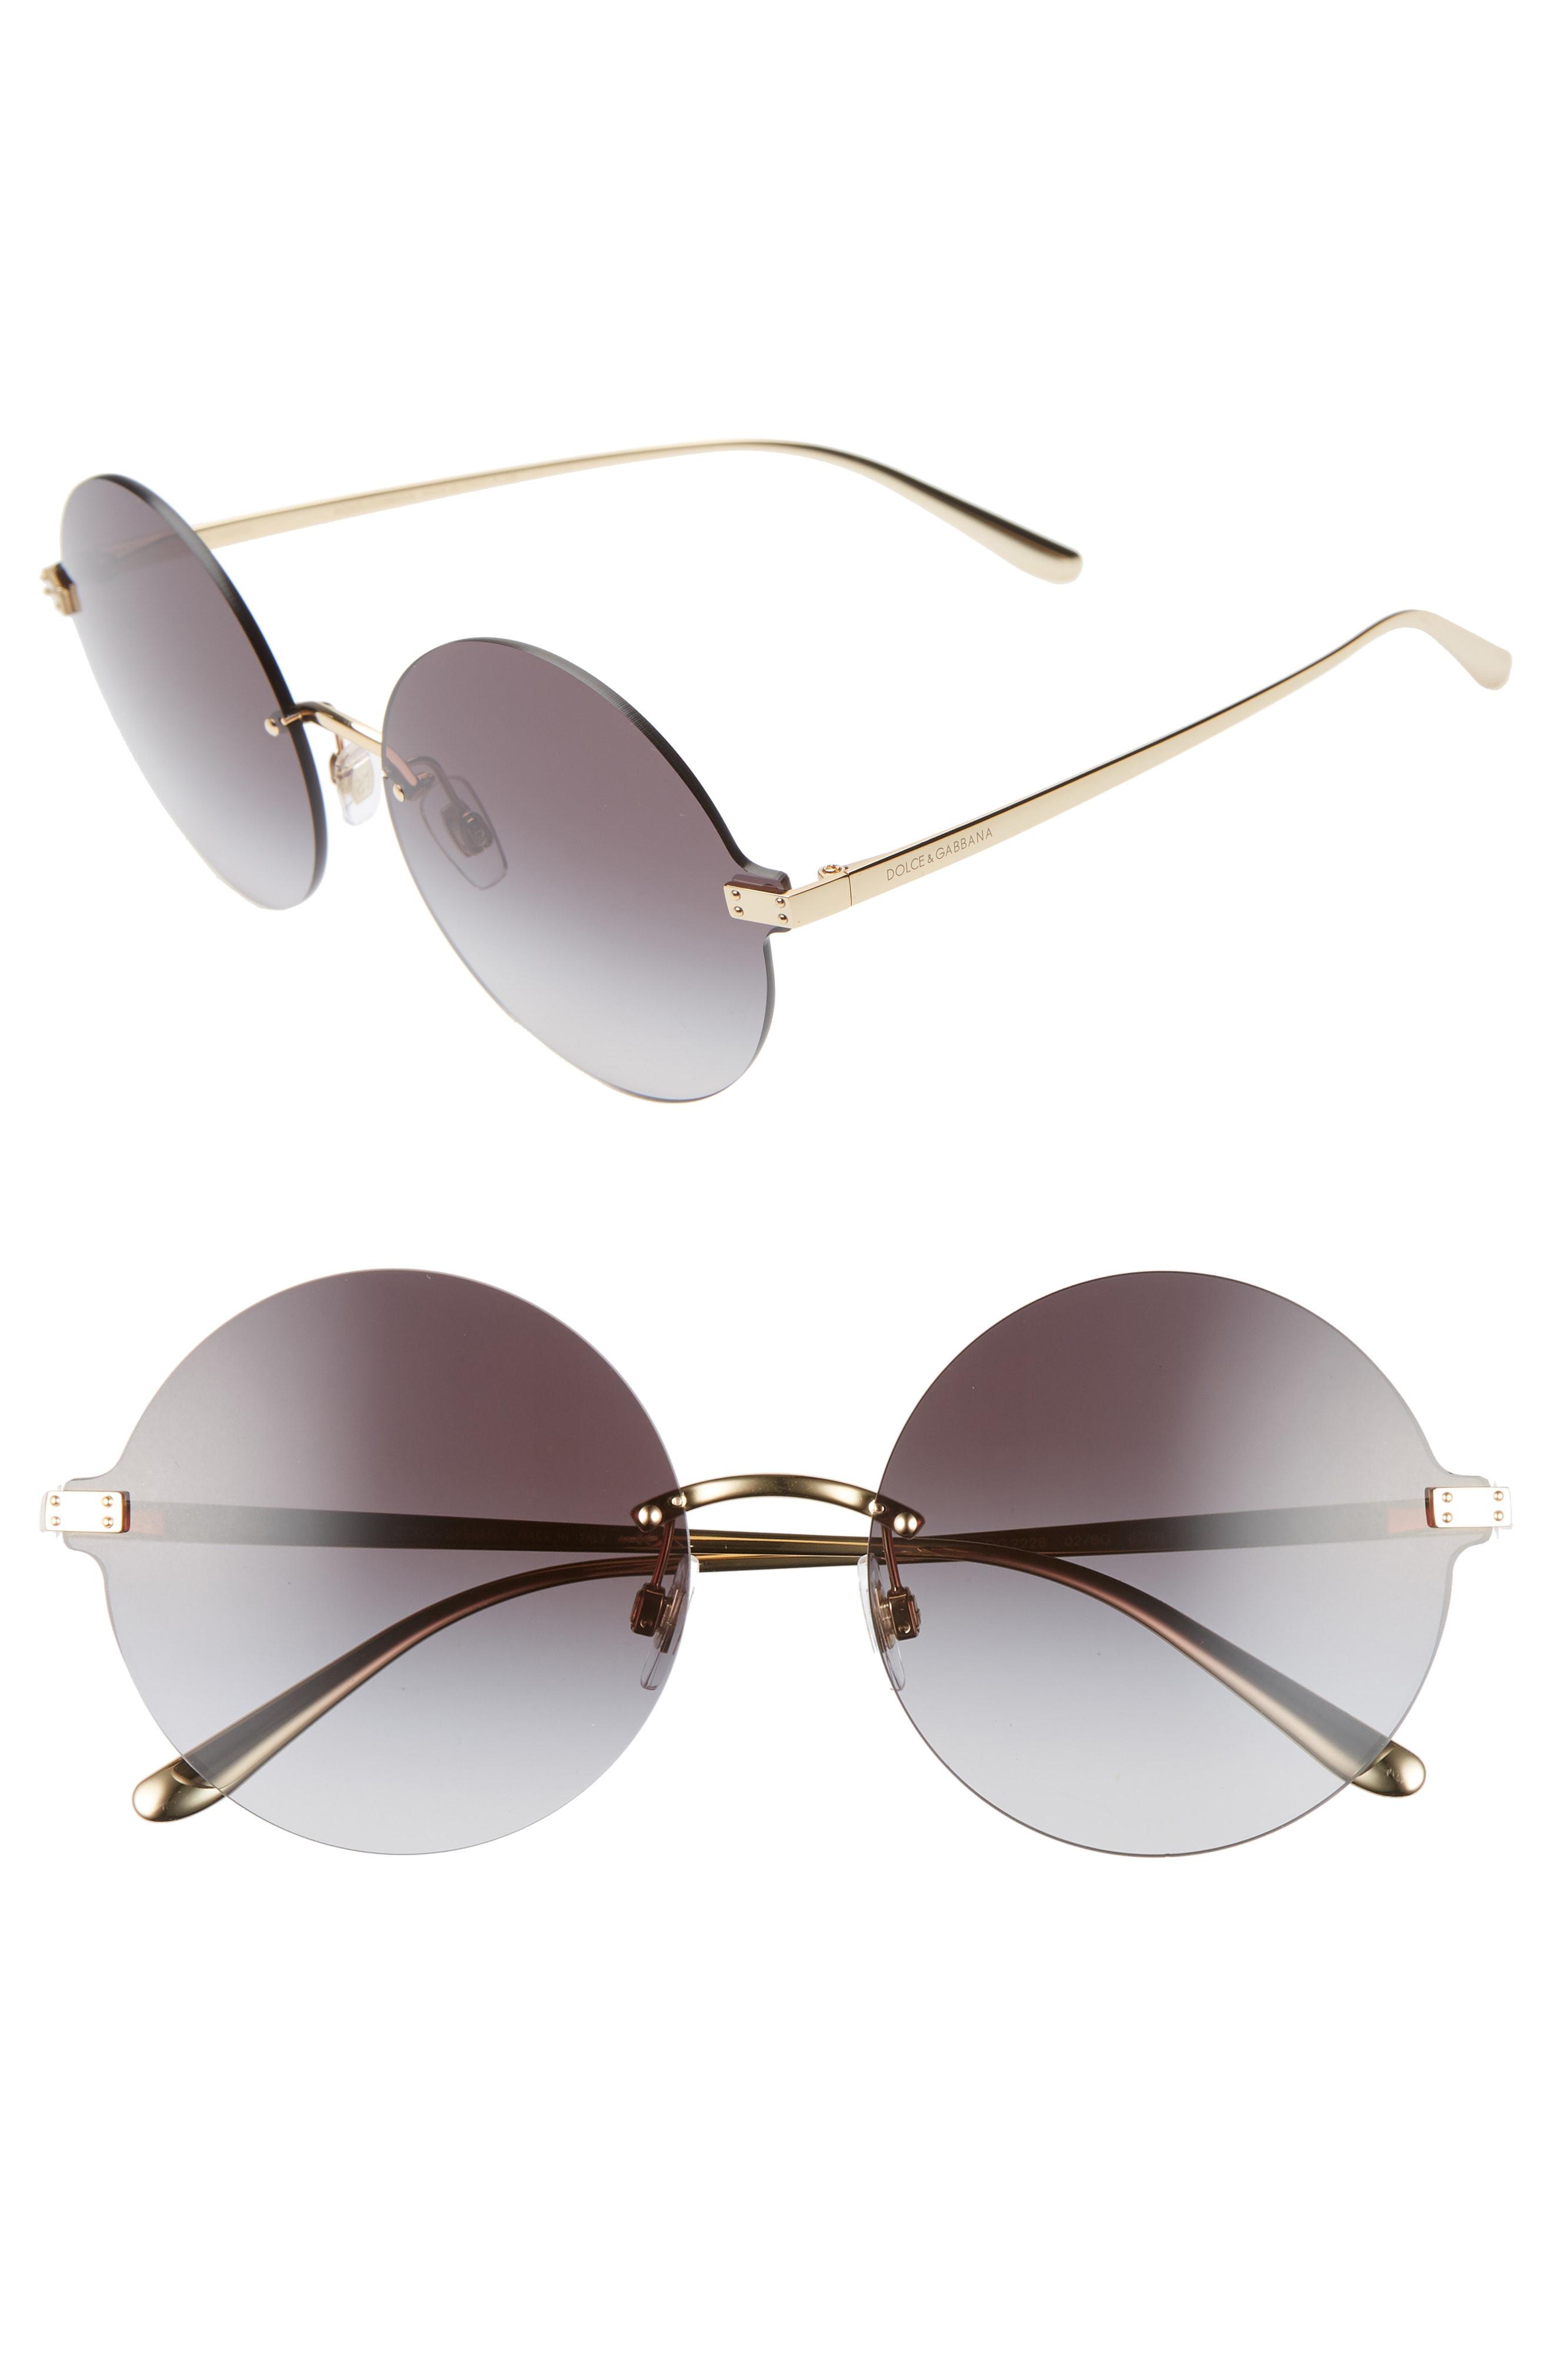 ff67da267379 Dolce & Gabbana 62Mm Oversize Gradient Rimless Round Sunglasses - Gold/  Black